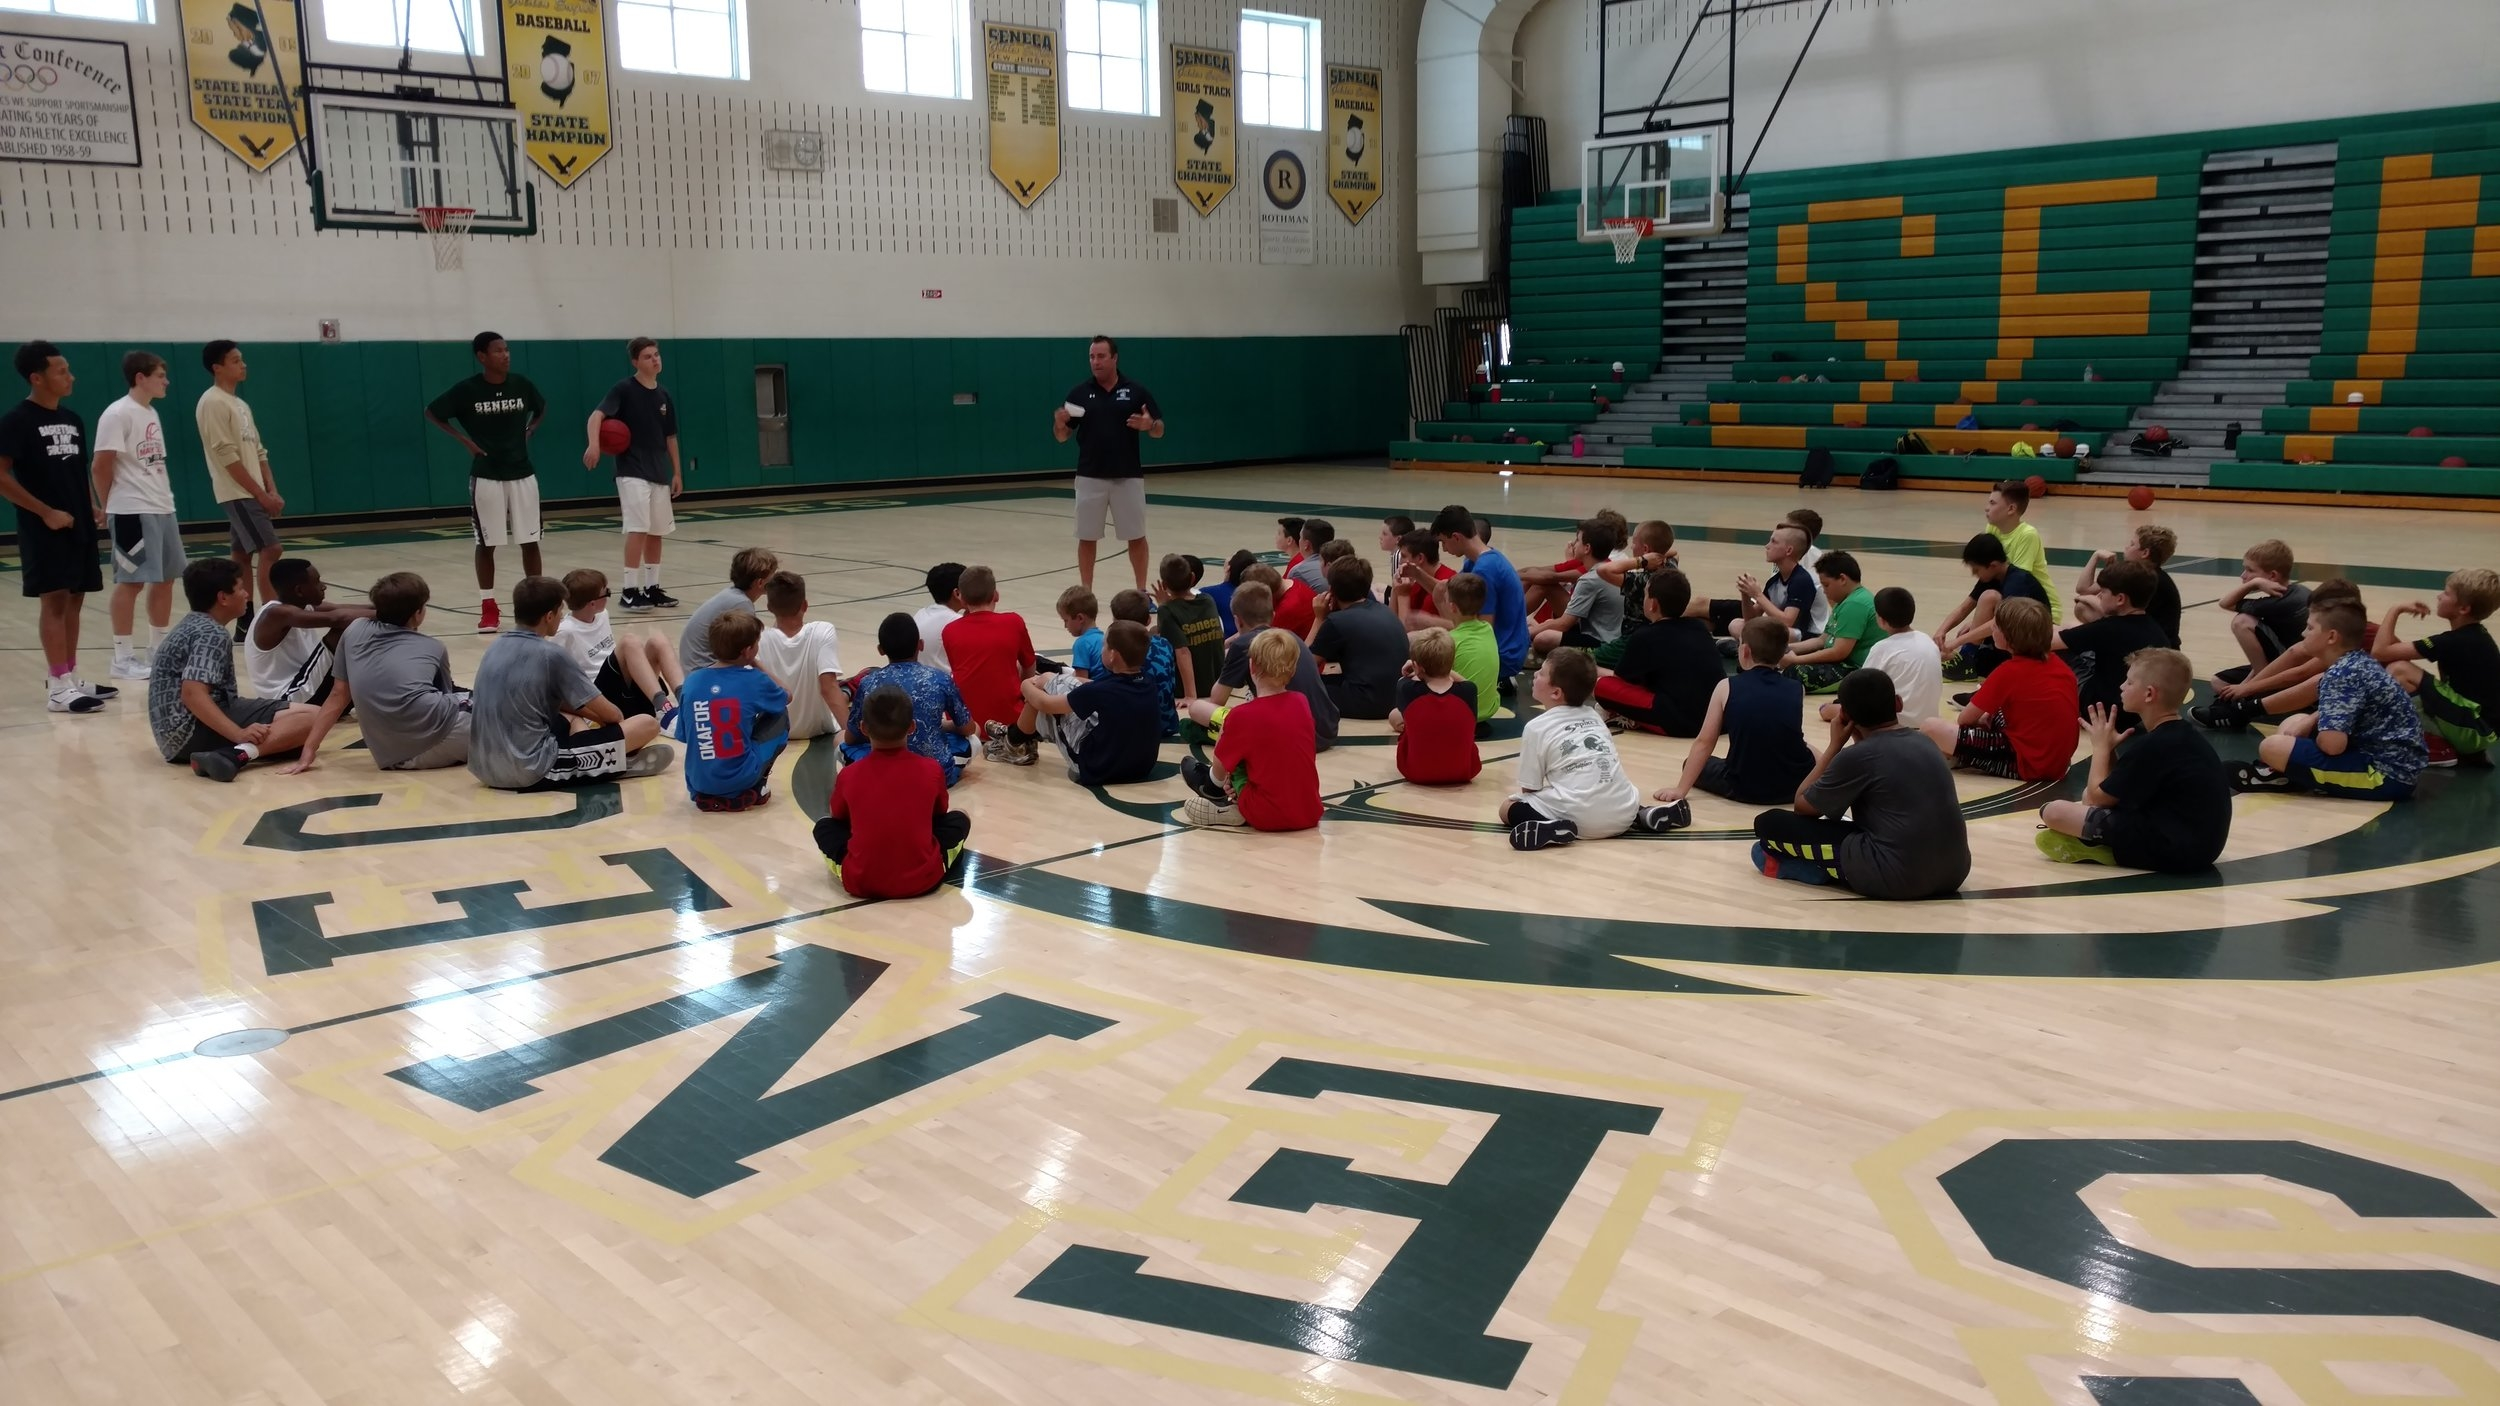 Stockton Head Men's Basketball Coach, Scott Bittner, was a guest speaker & instructor at the July 2017 Seneca Boys Basketball Camp